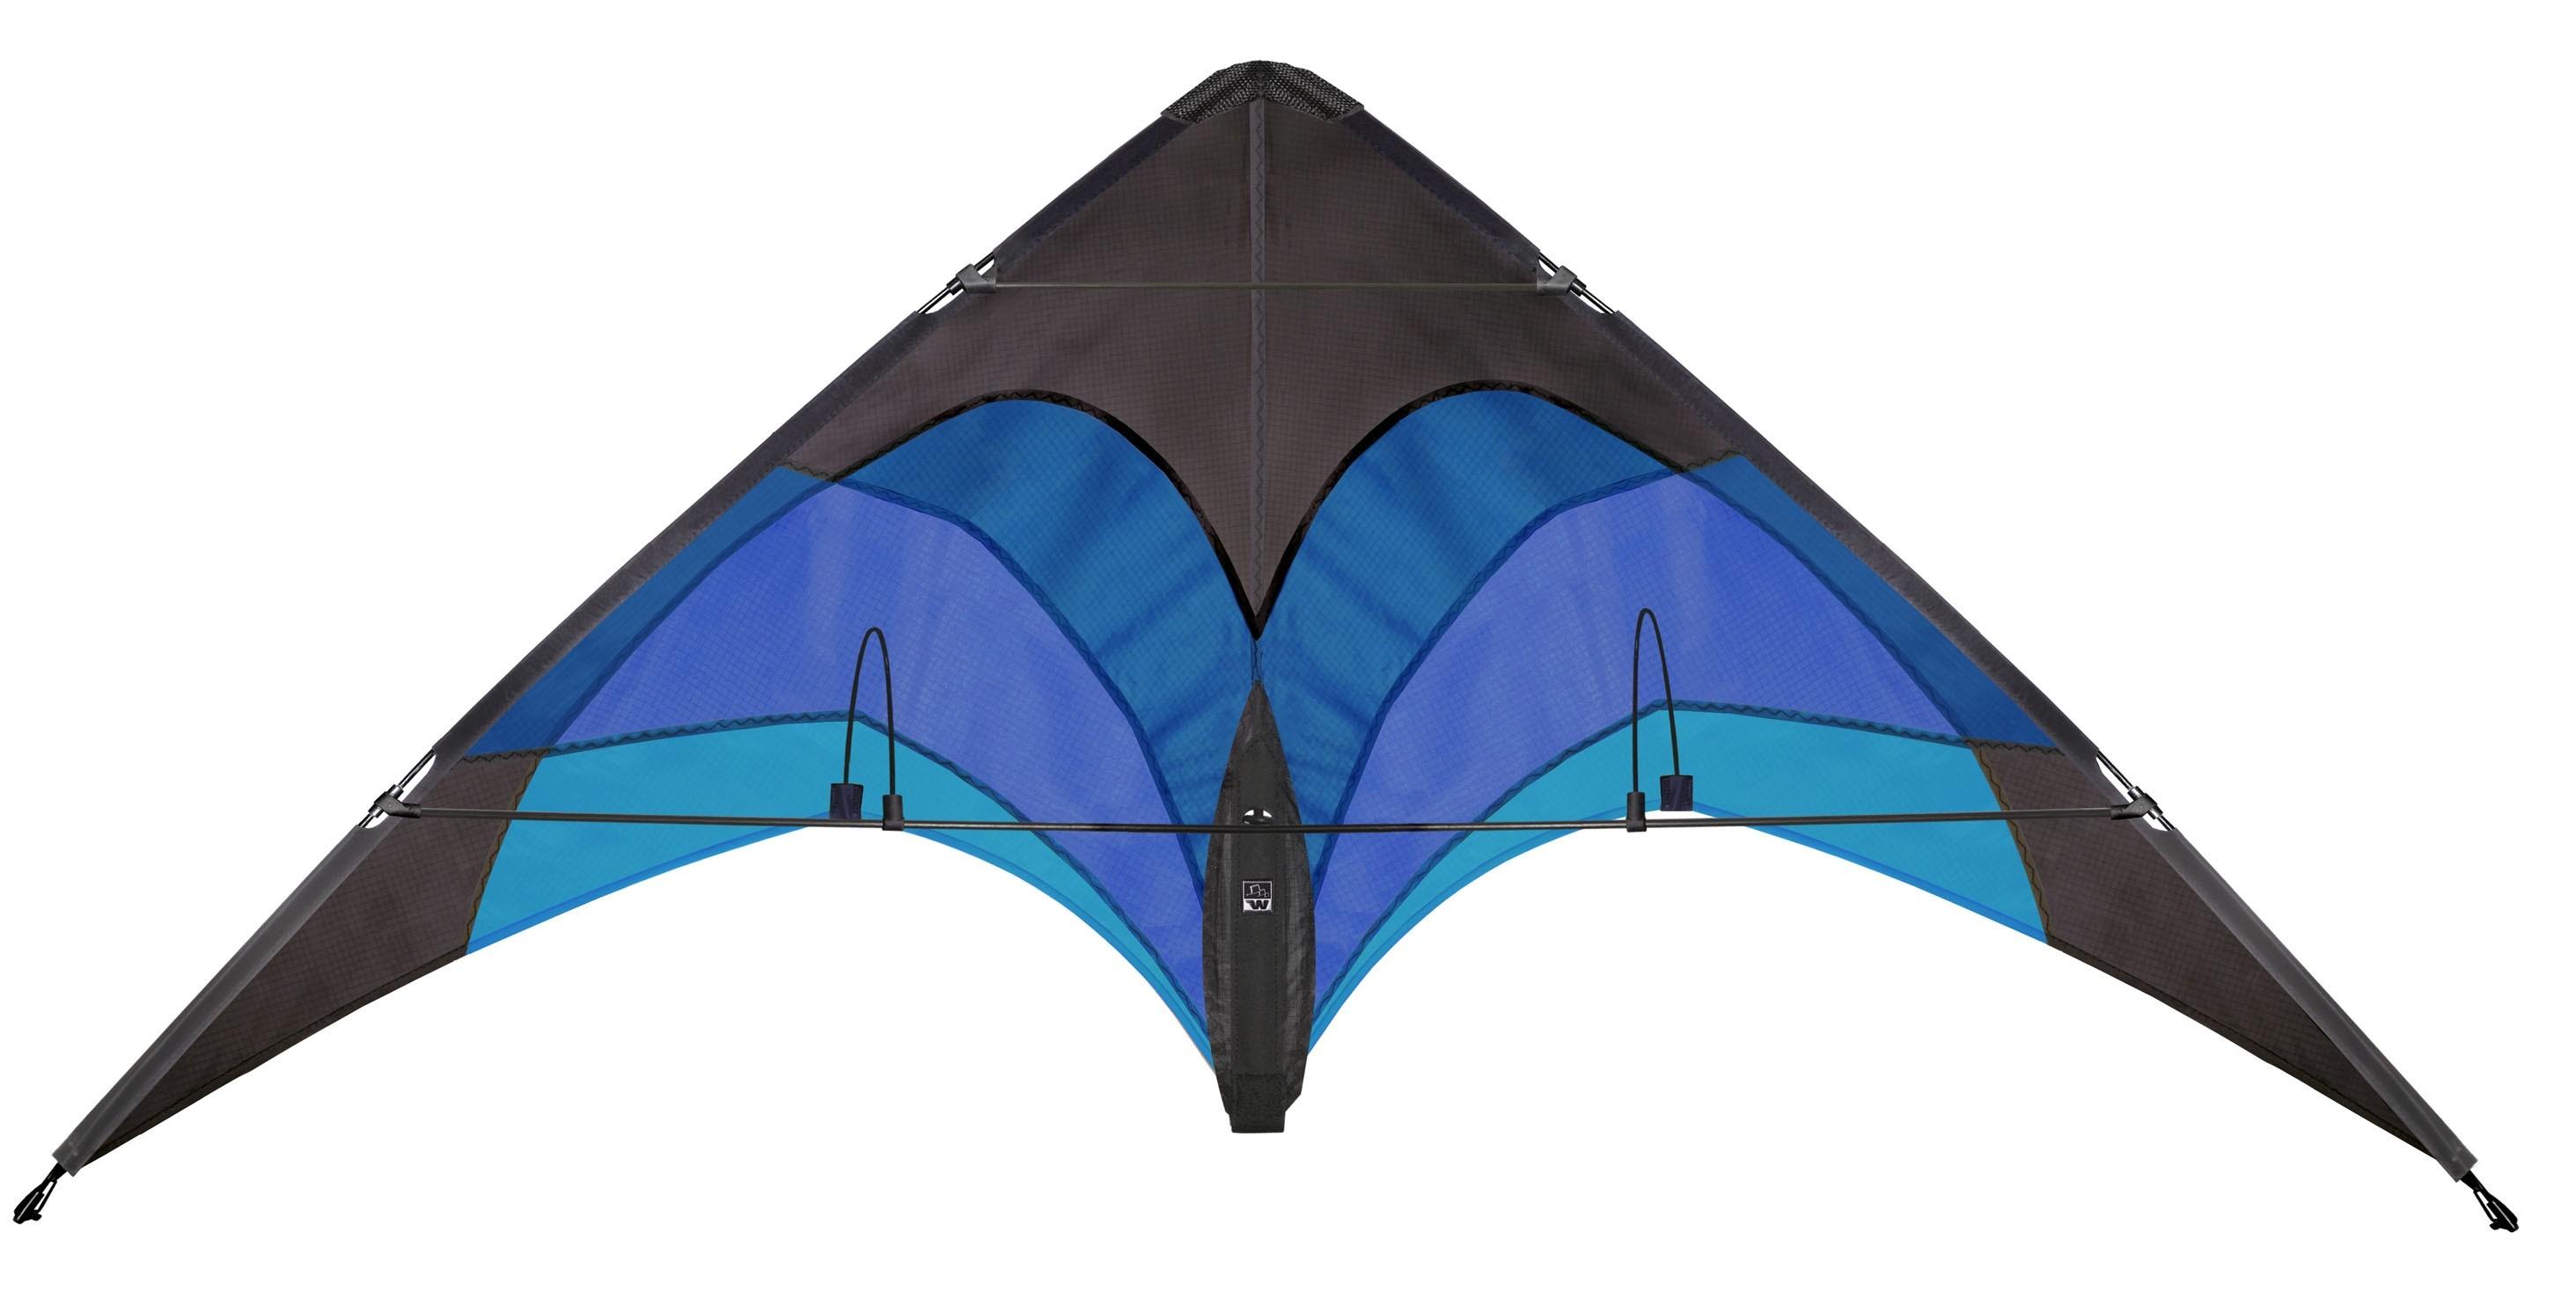 Wolkensturmer | Flip Kite - Blue